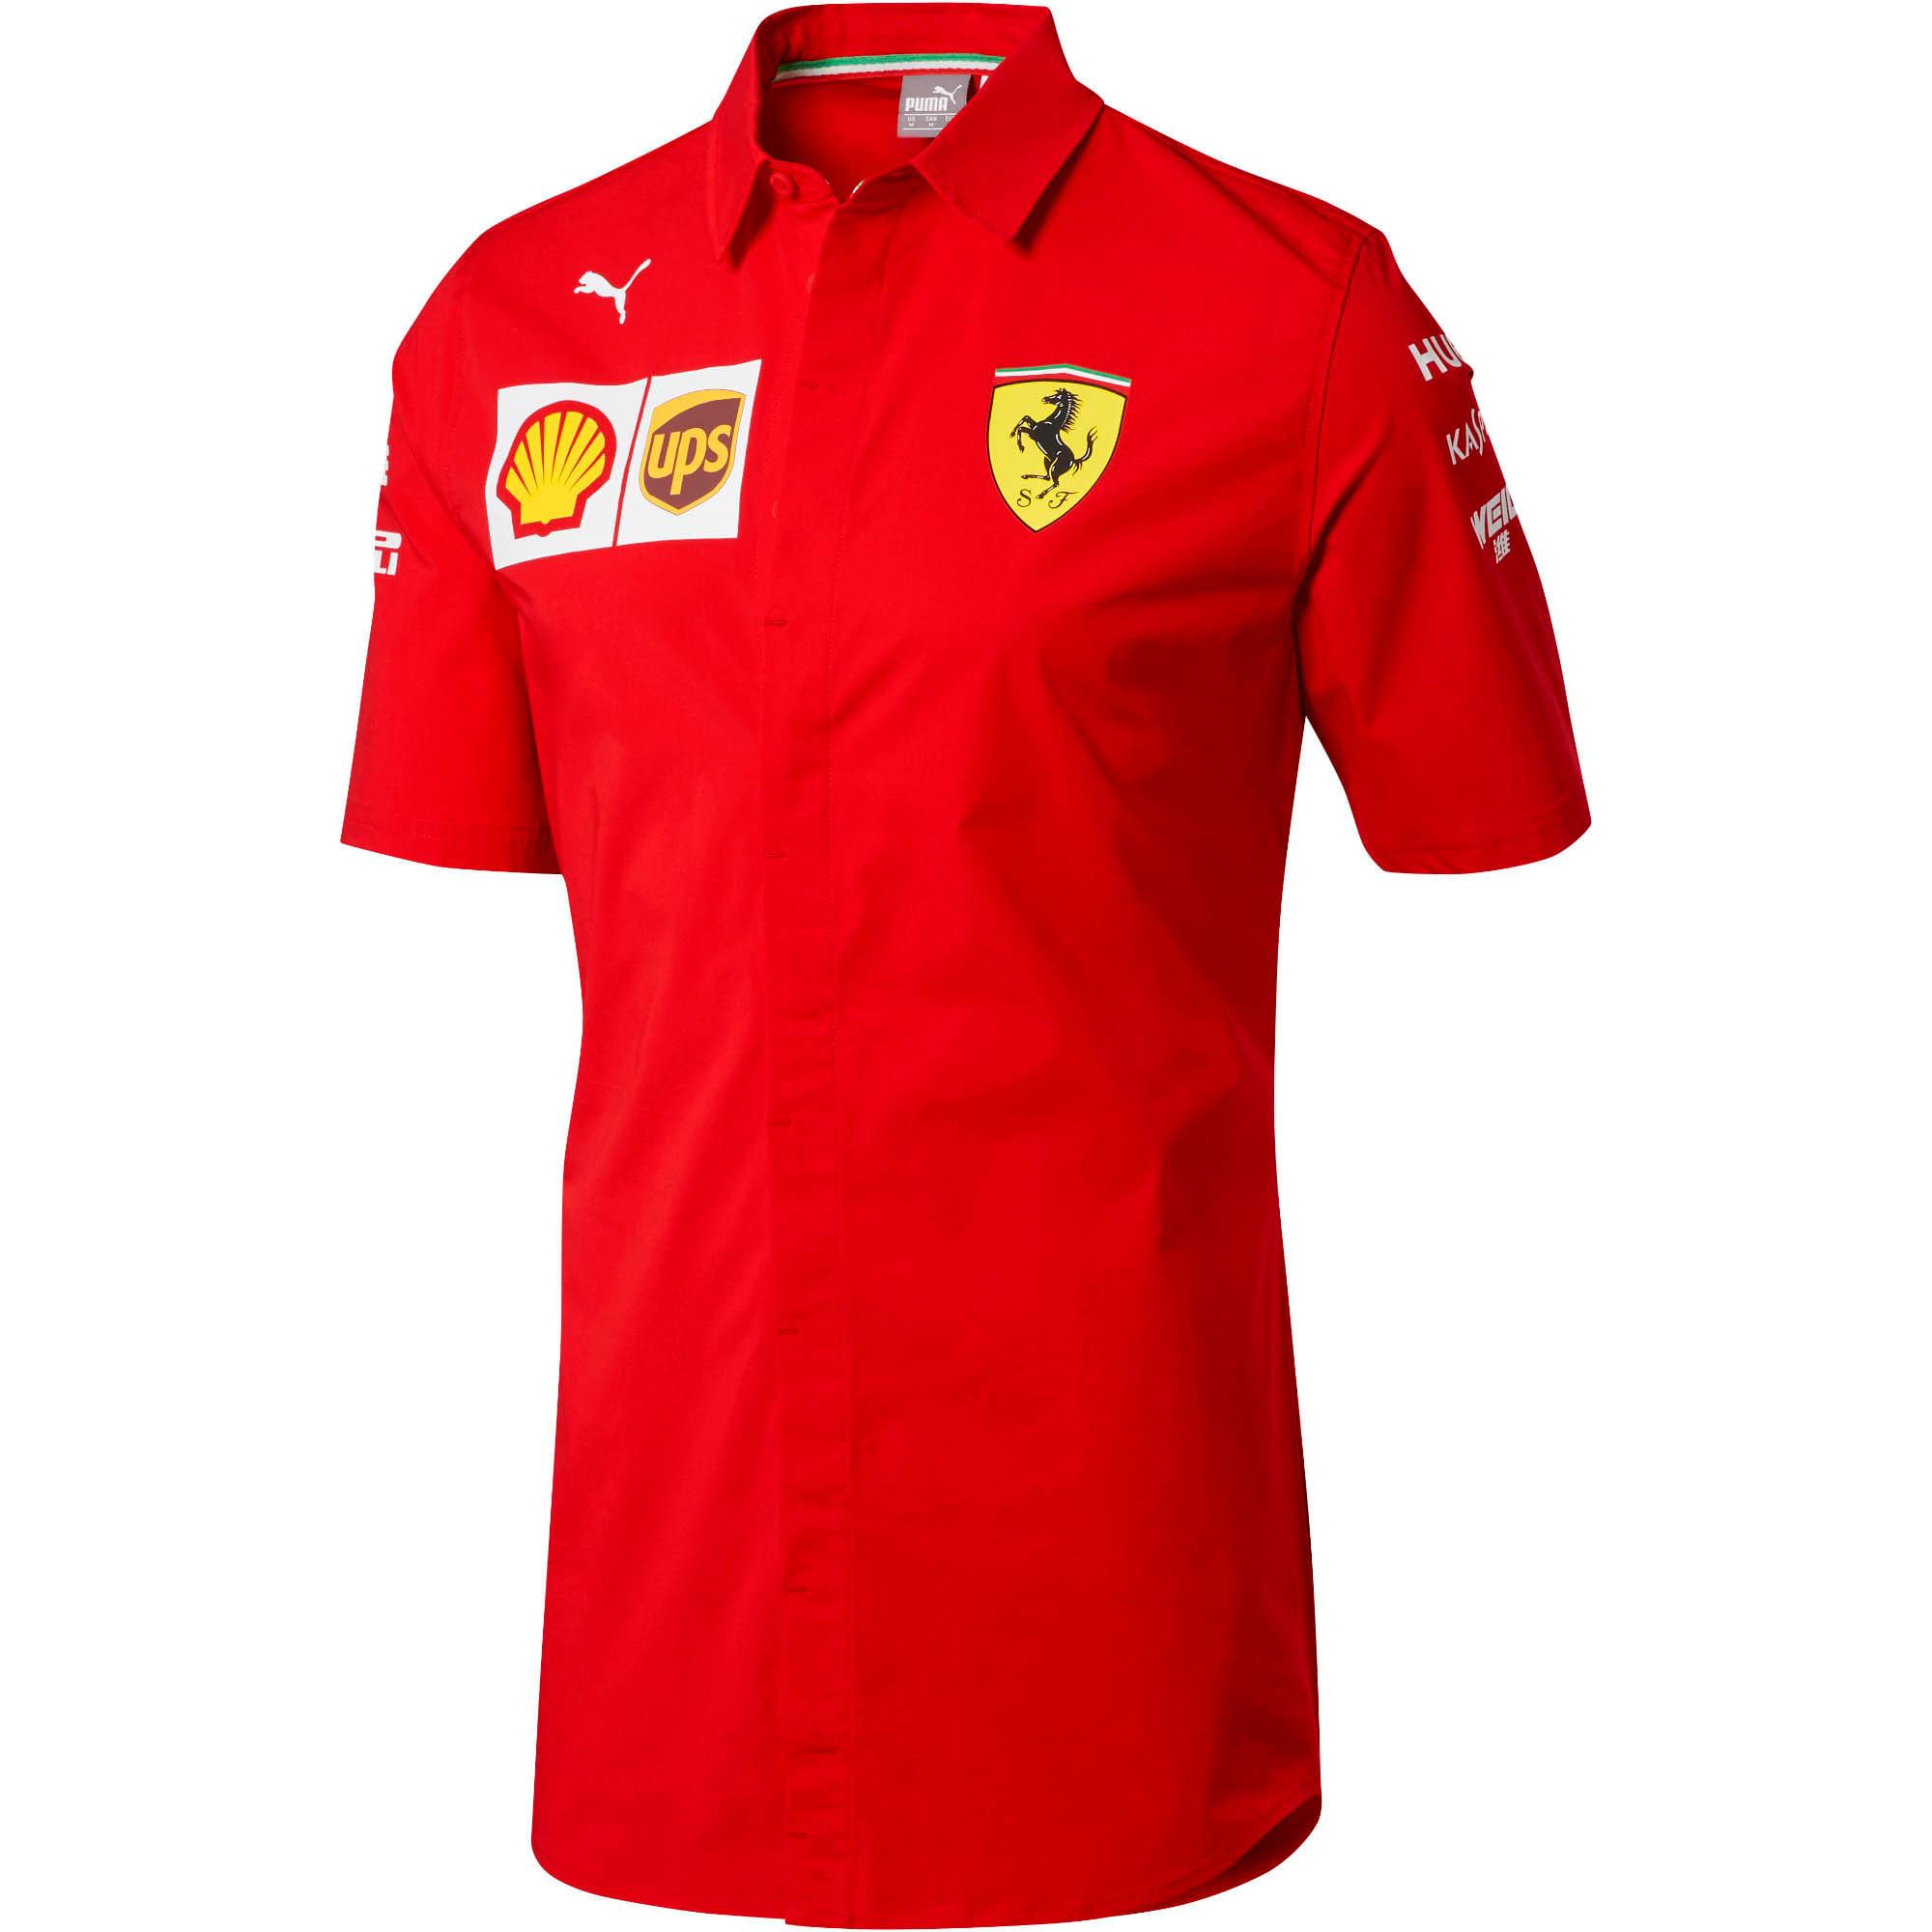 Miniatura 4 de Camiseta del equipo Scuderia Ferrari para hombre, Rosso Corsa-without MW Logo, mediano